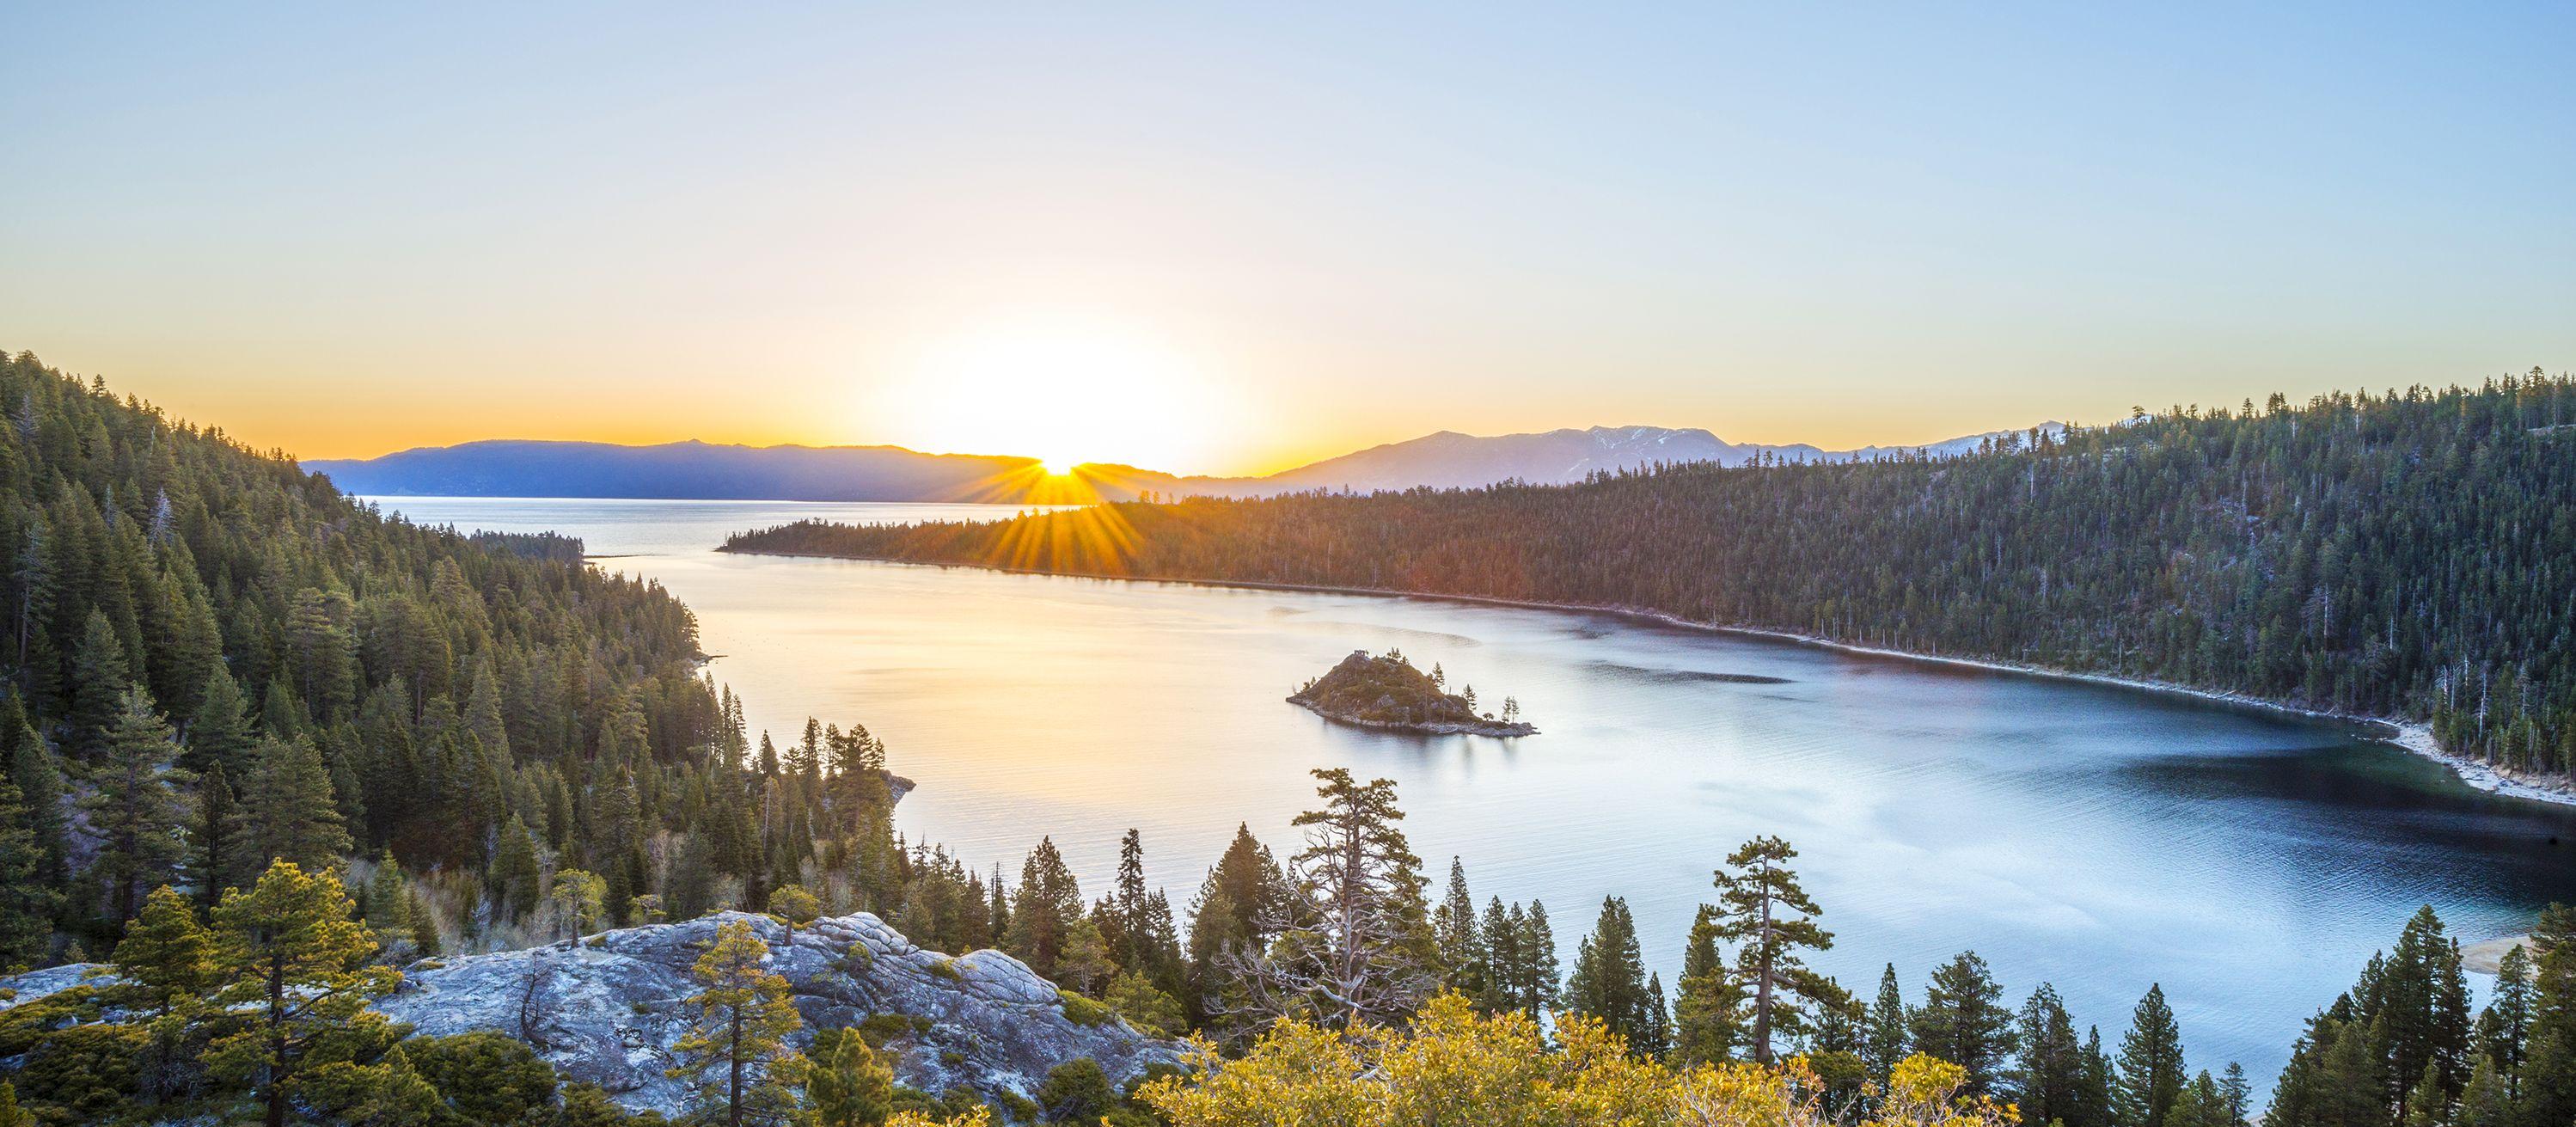 Sonnenuntergang über dem Lake Tahoe